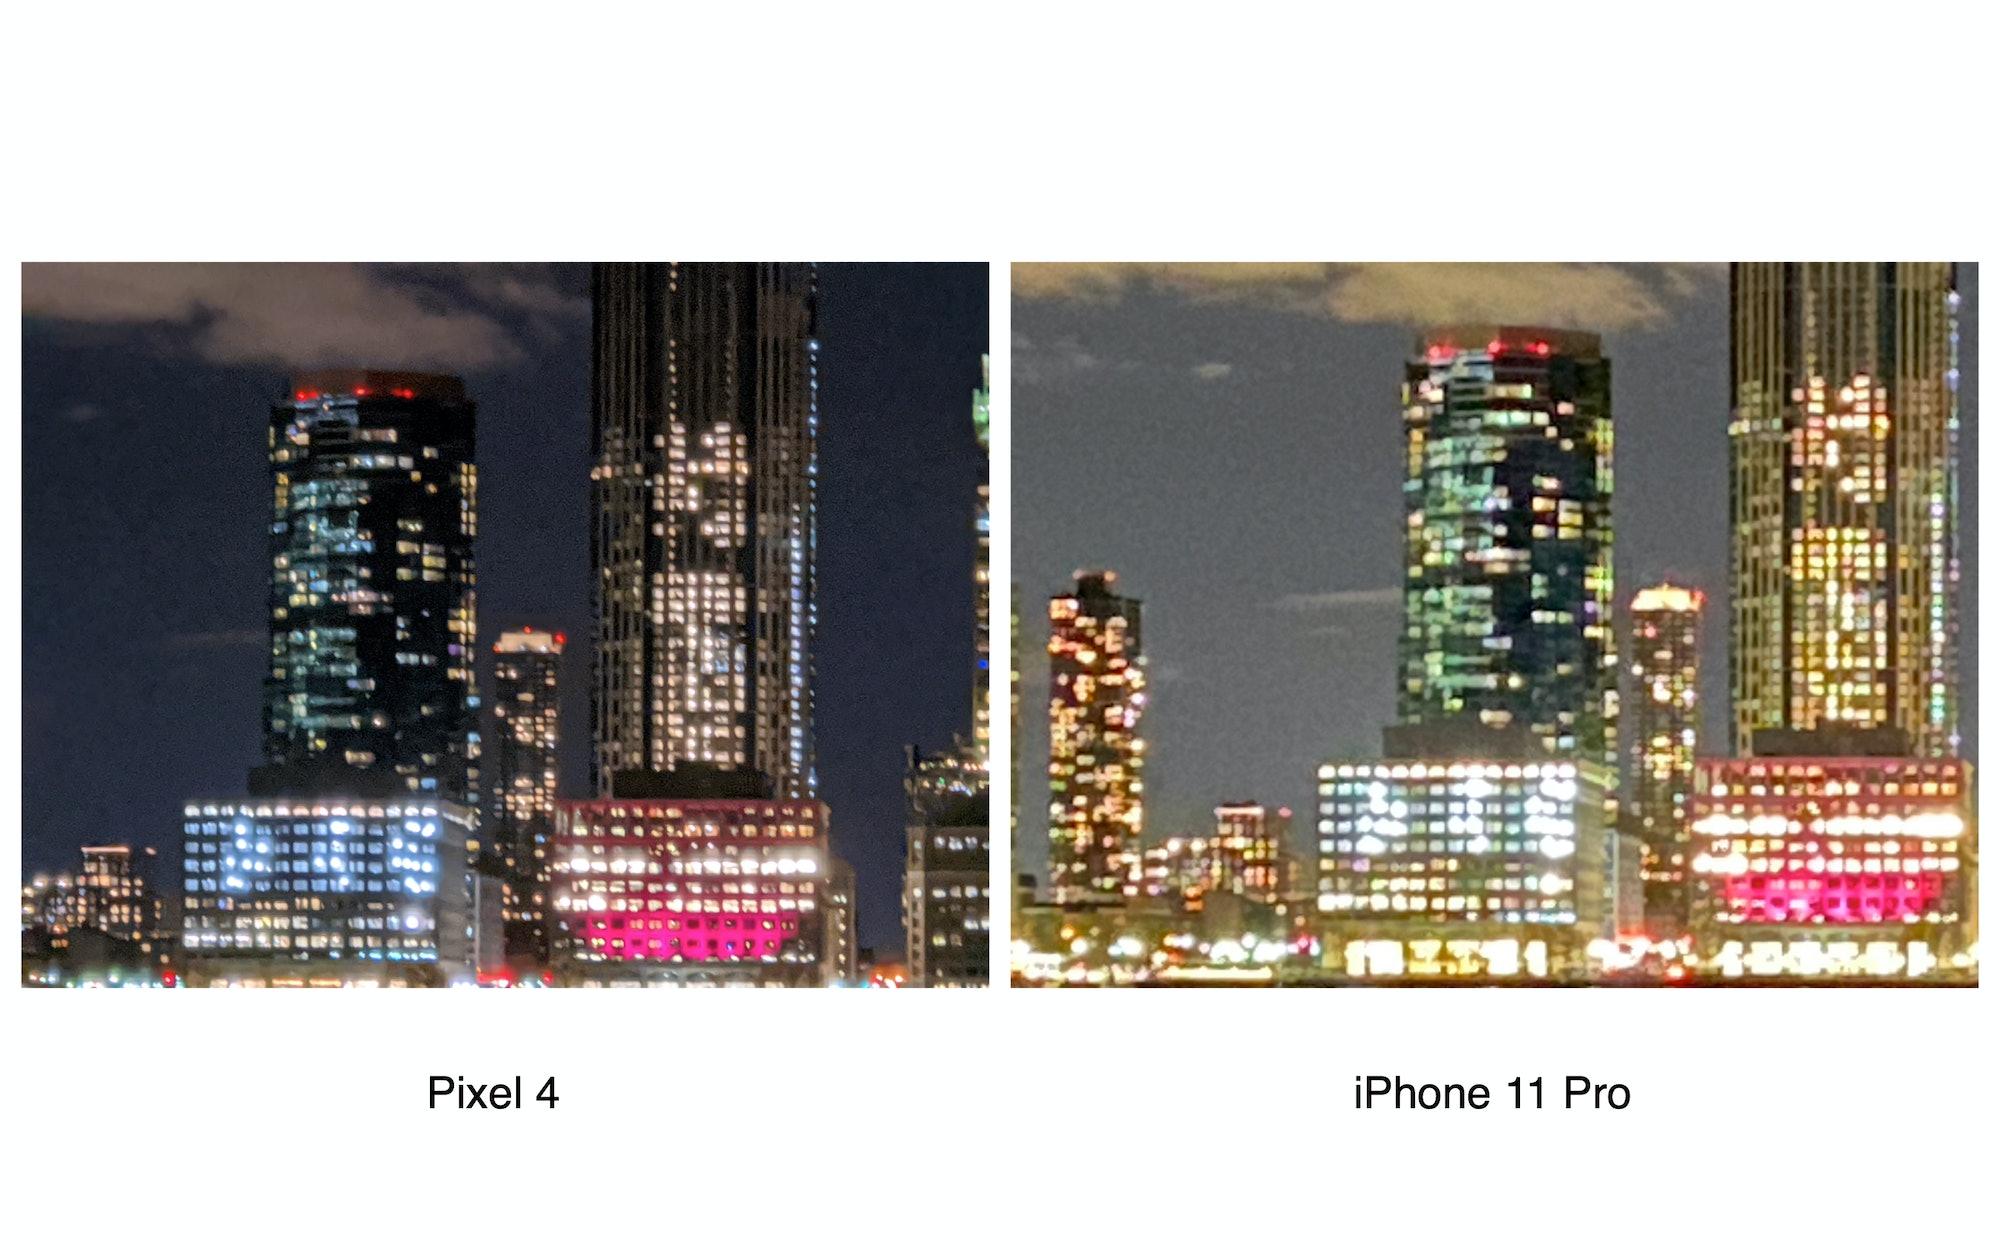 Pixel 4 8x digital zoom vs. iPhone 11 Pro